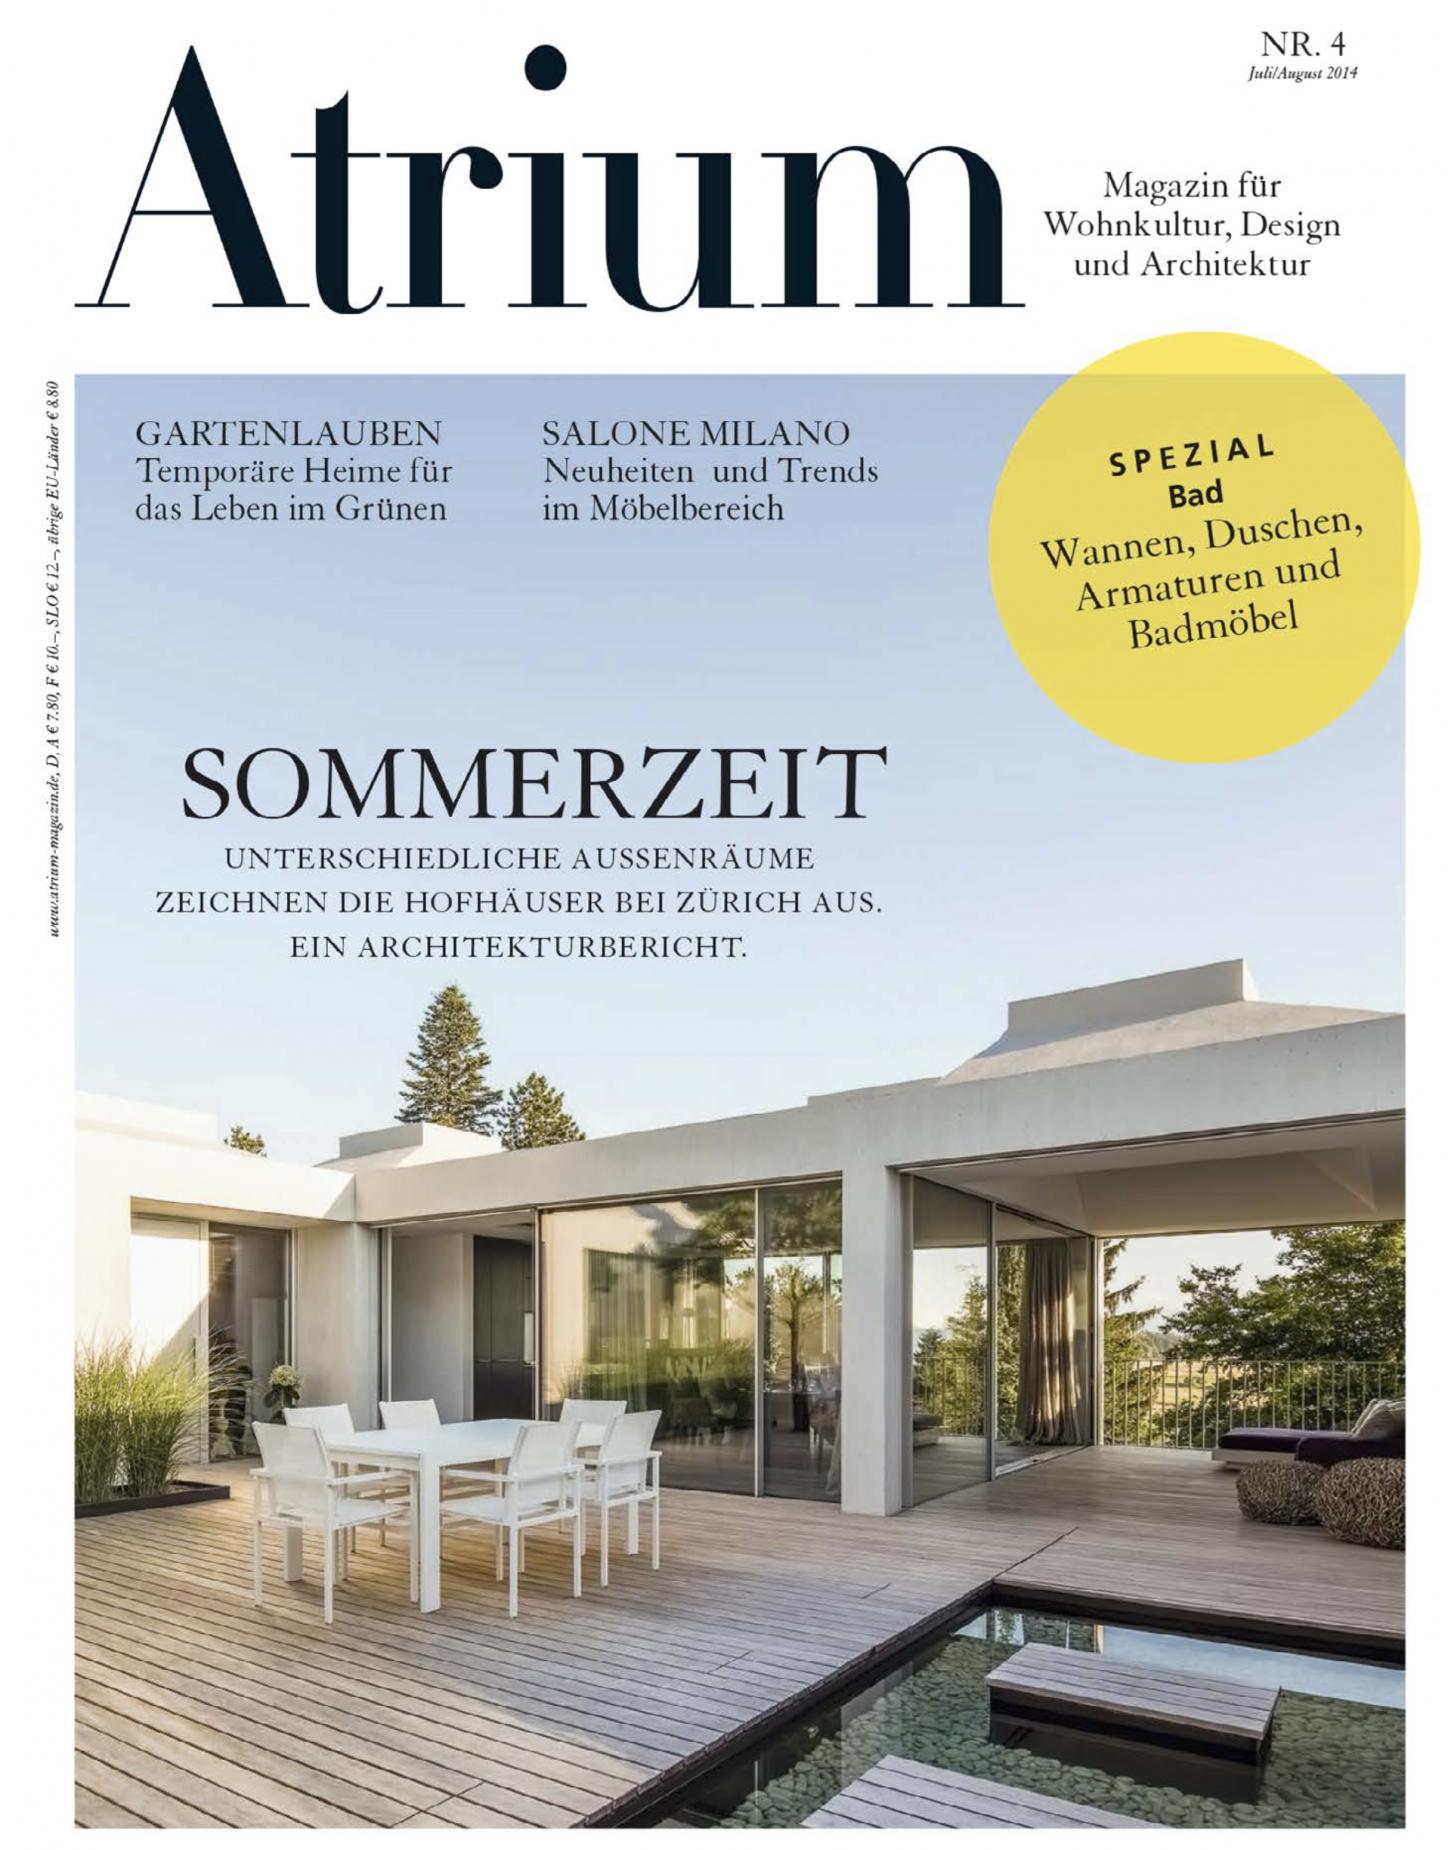 Atrium (Germany)   vilablanch. Estudio de arquitectura interior ...